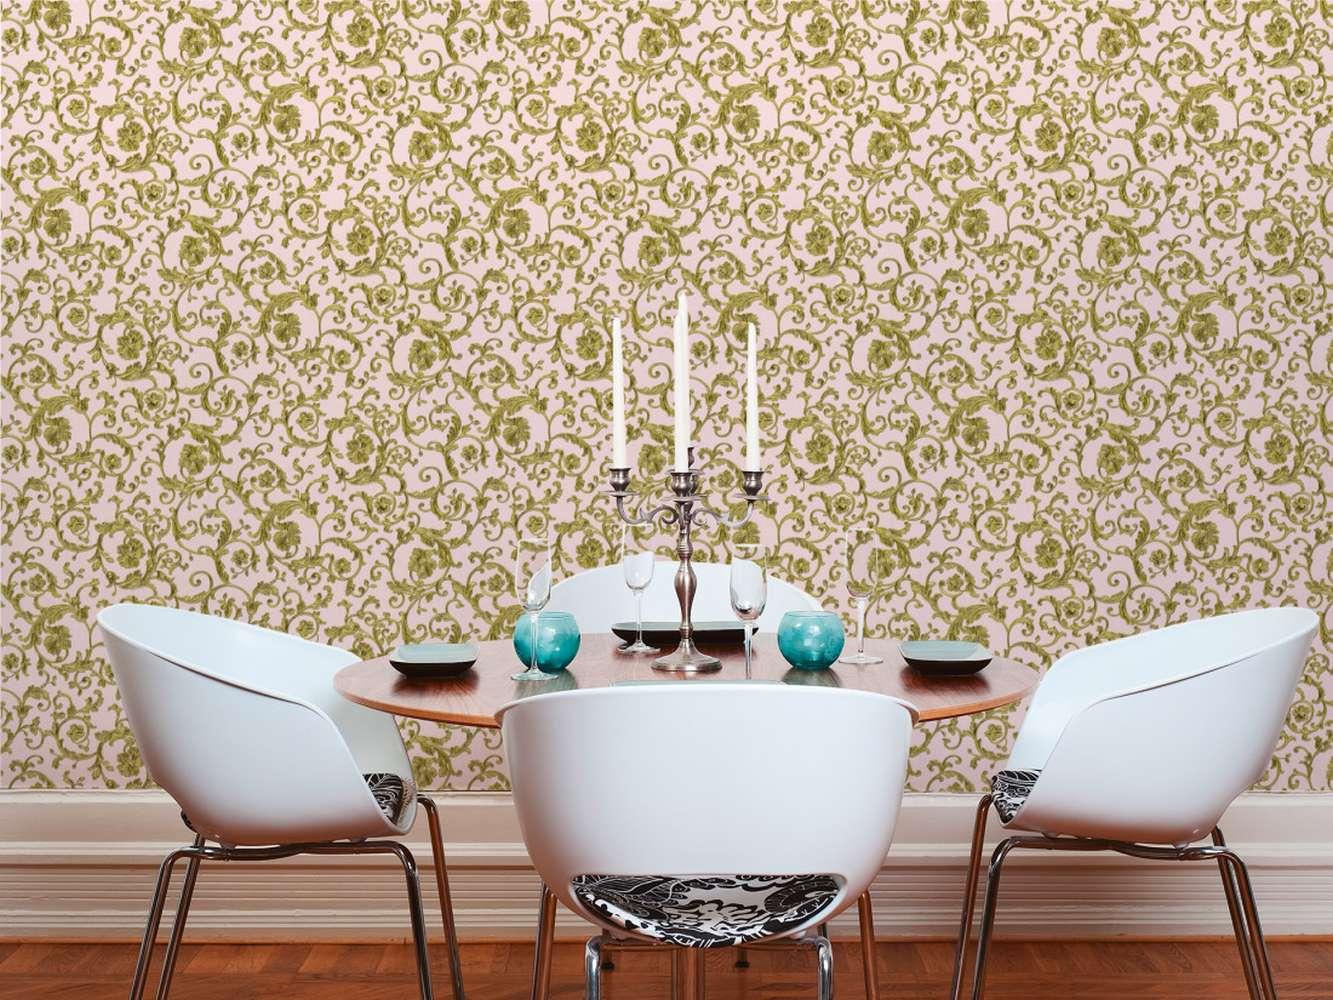 versace home tapete floral ros gold glitzer 34326 4. Black Bedroom Furniture Sets. Home Design Ideas